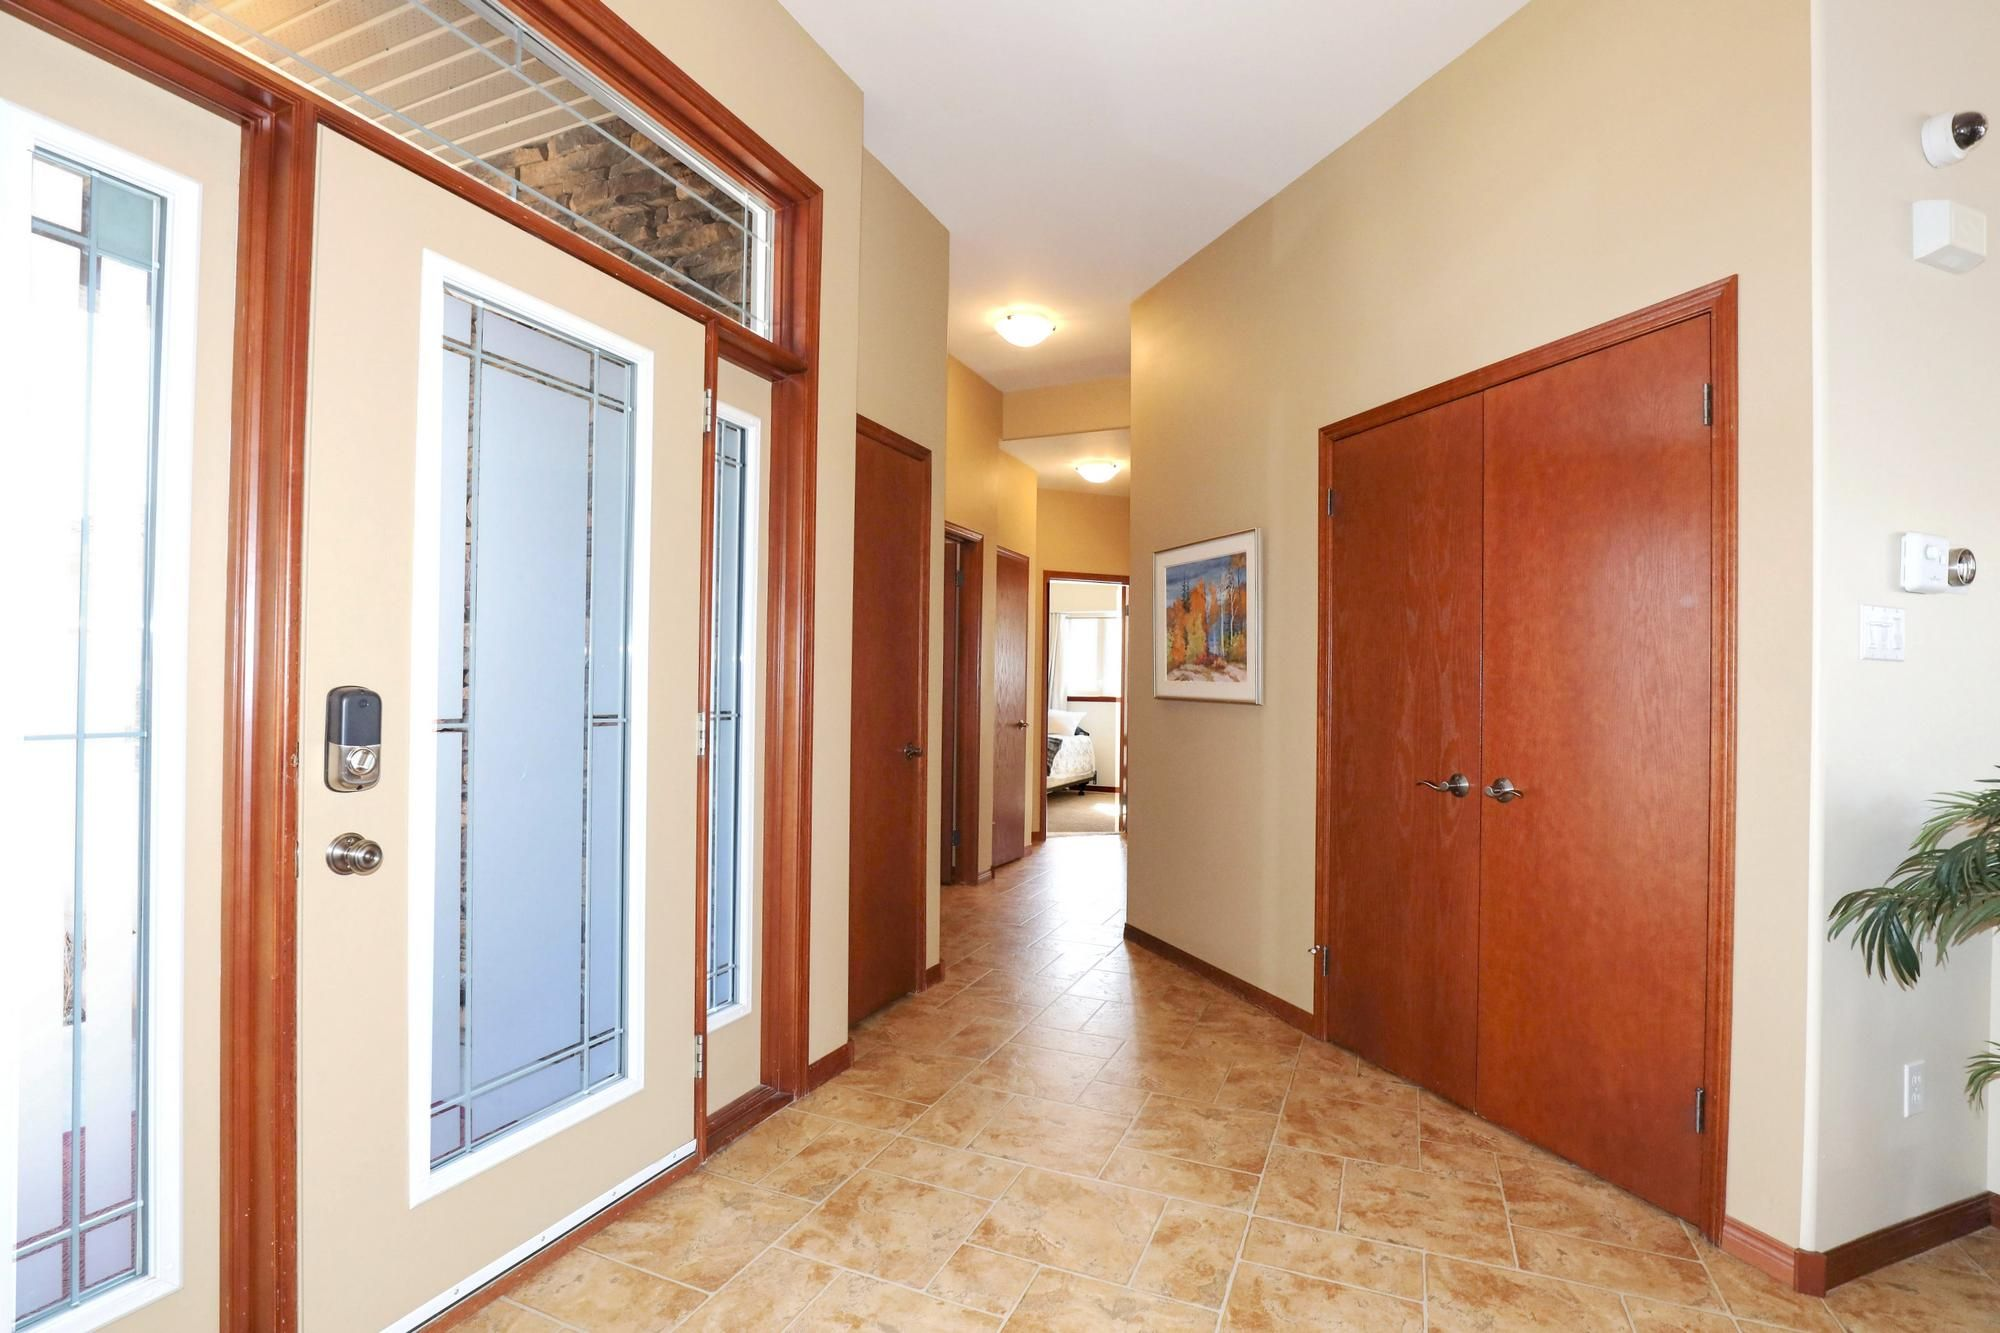 Photo 4: Photos: 7 Castle Ridge Drive in Winnipeg: Linden Ridge Single Family Detached for sale (1M)  : MLS®# 202107901